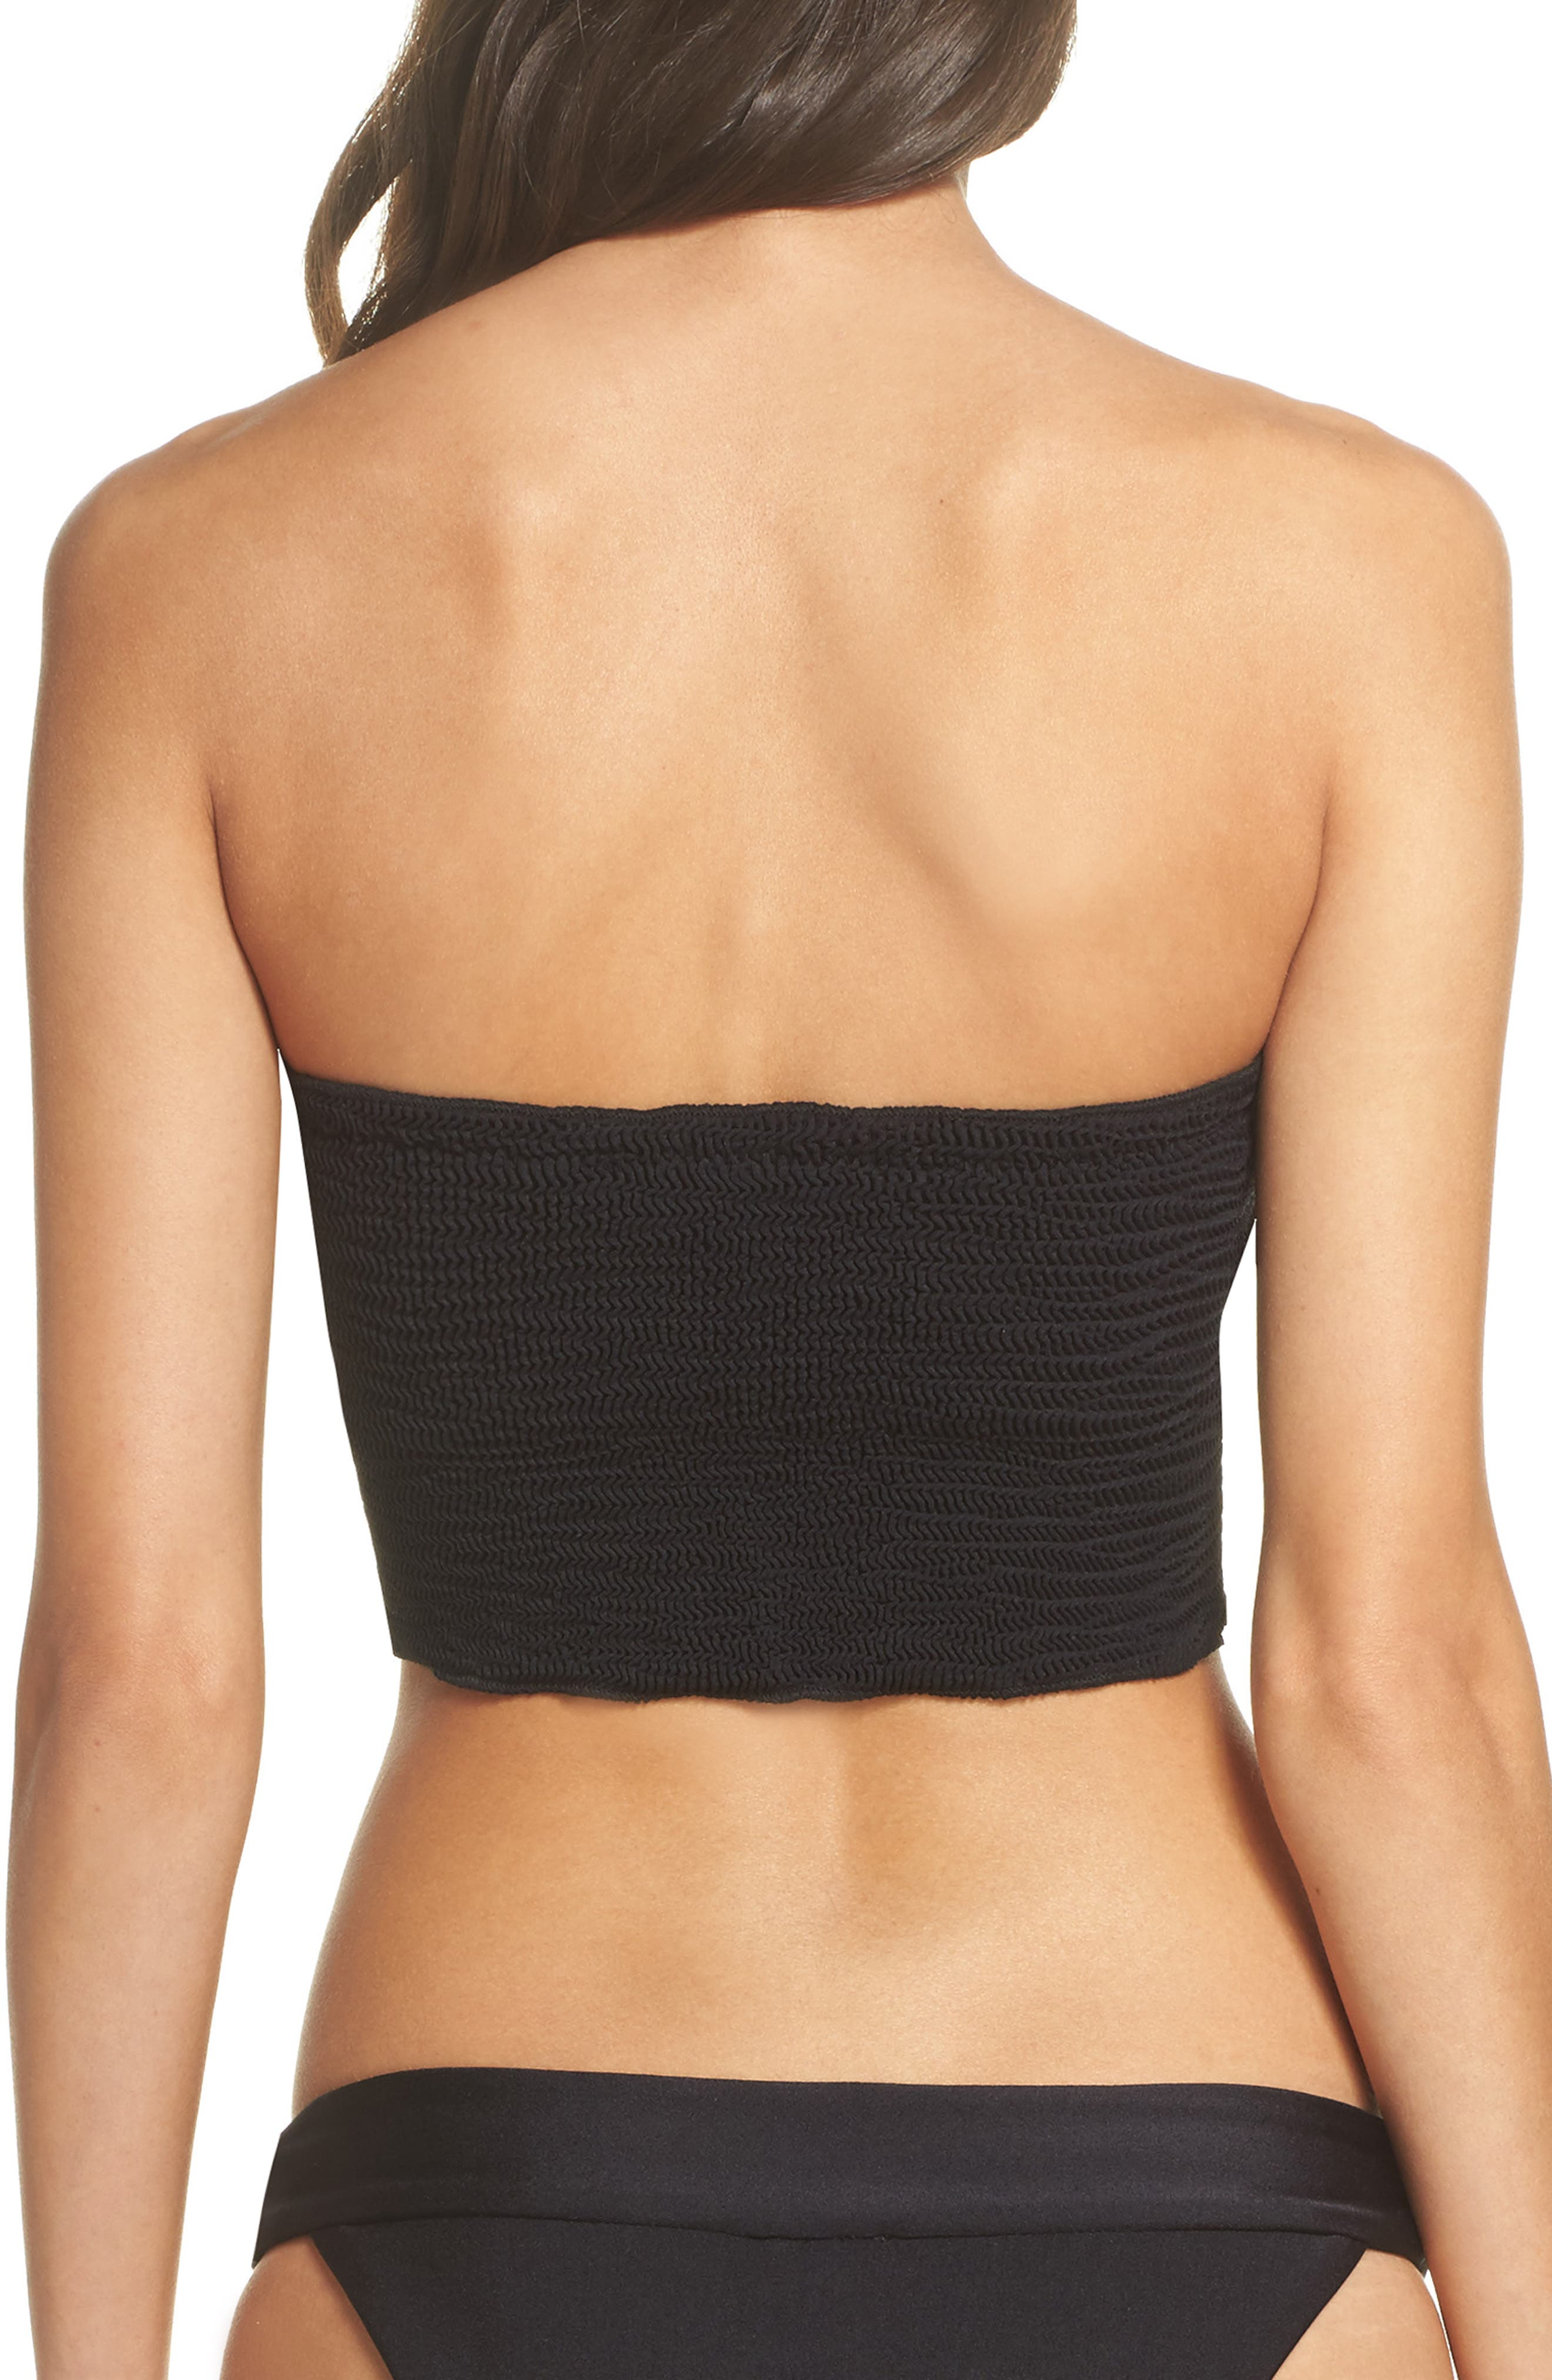 ISABELLA ROSE, Tubular Bikini Top, Alternate thumbnail 2, color, 001